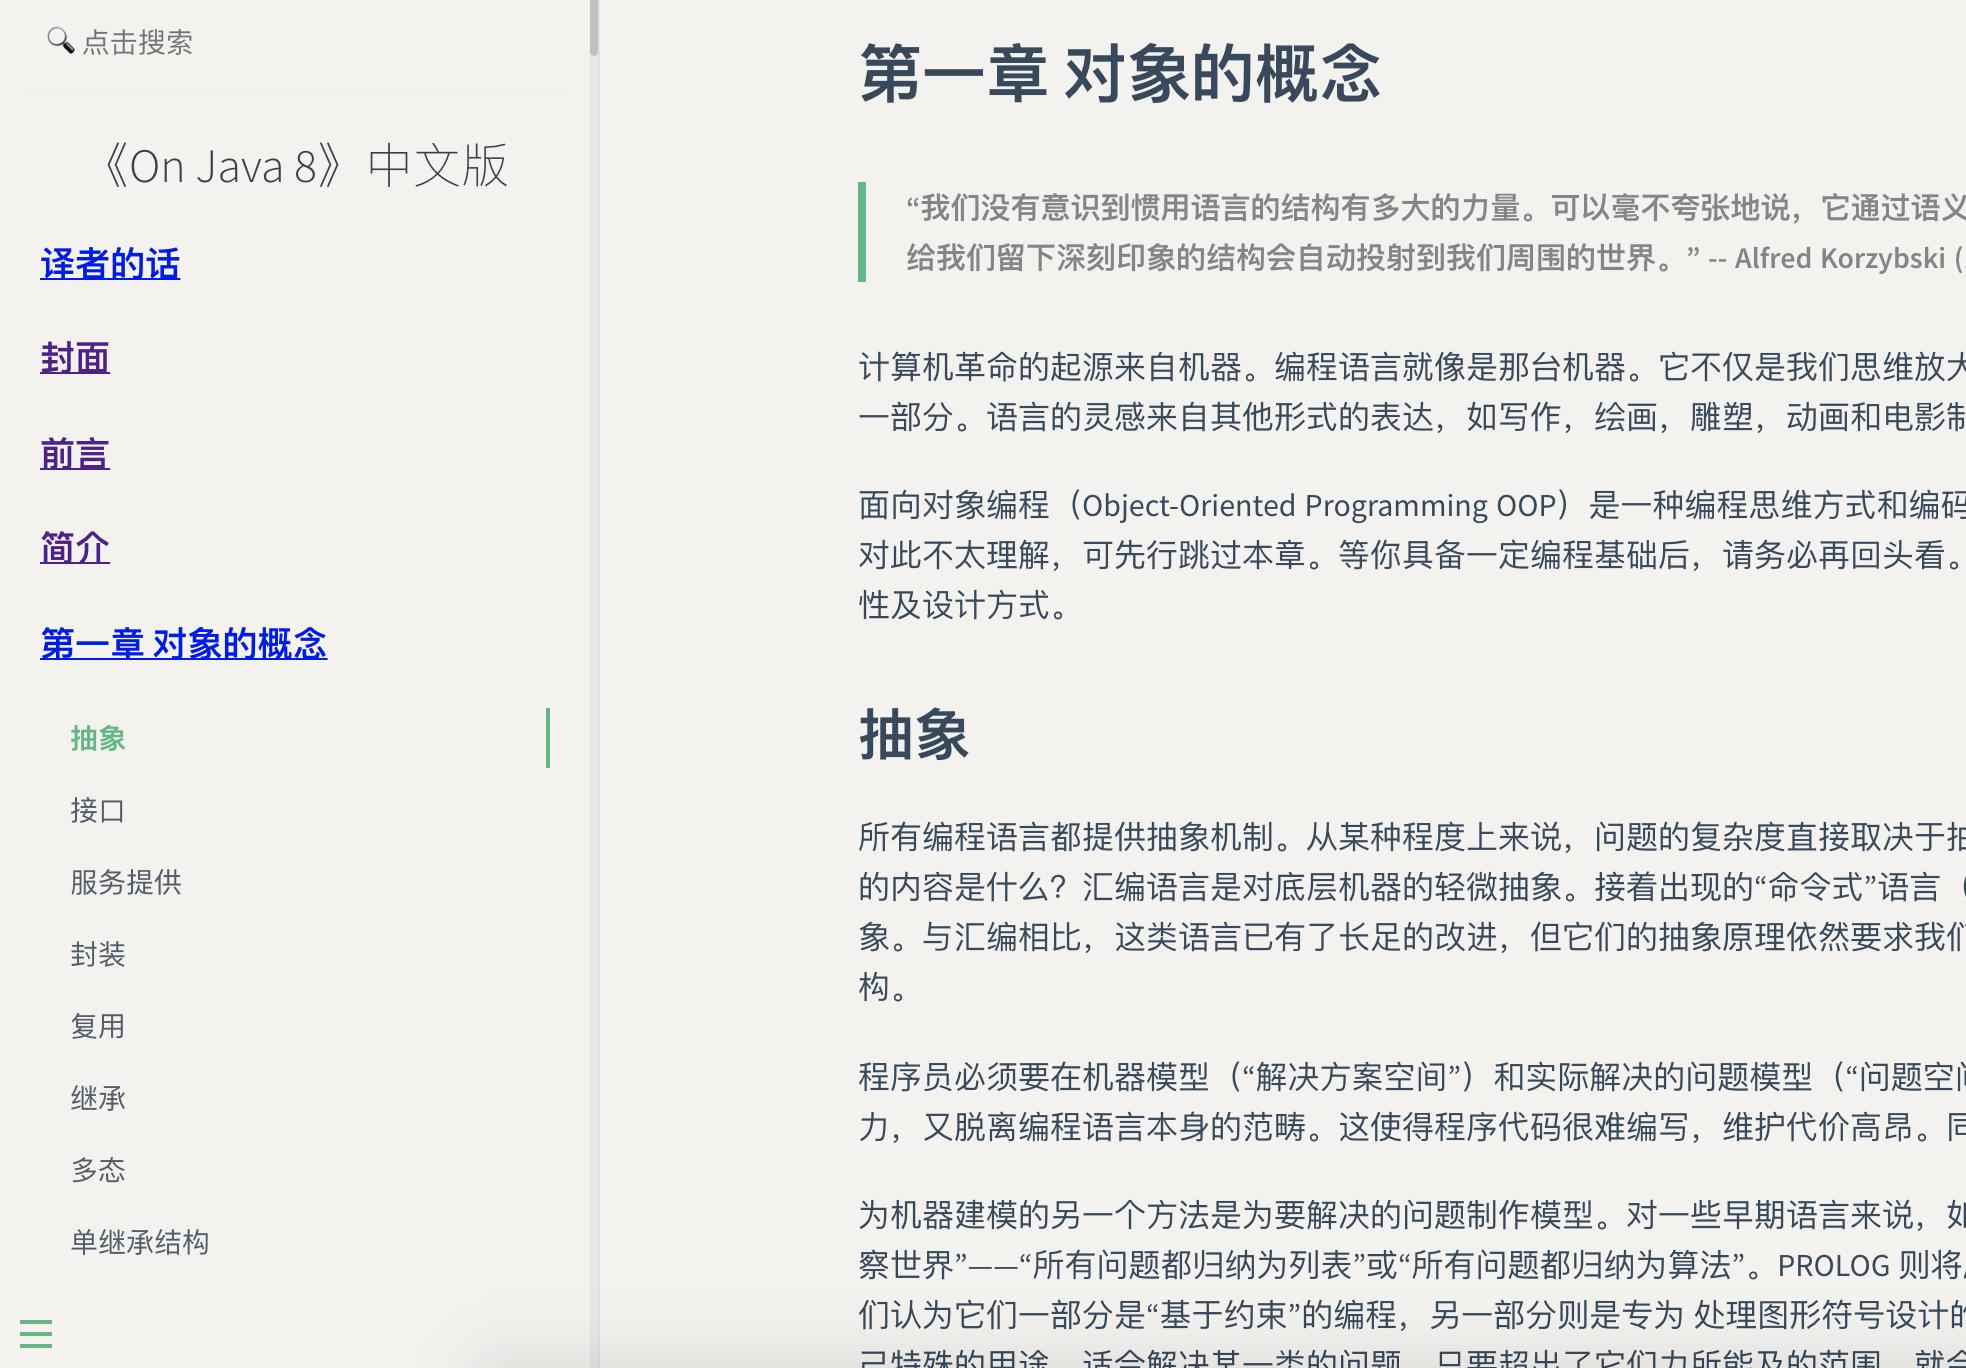 图 10-8《On Java 8》中文版